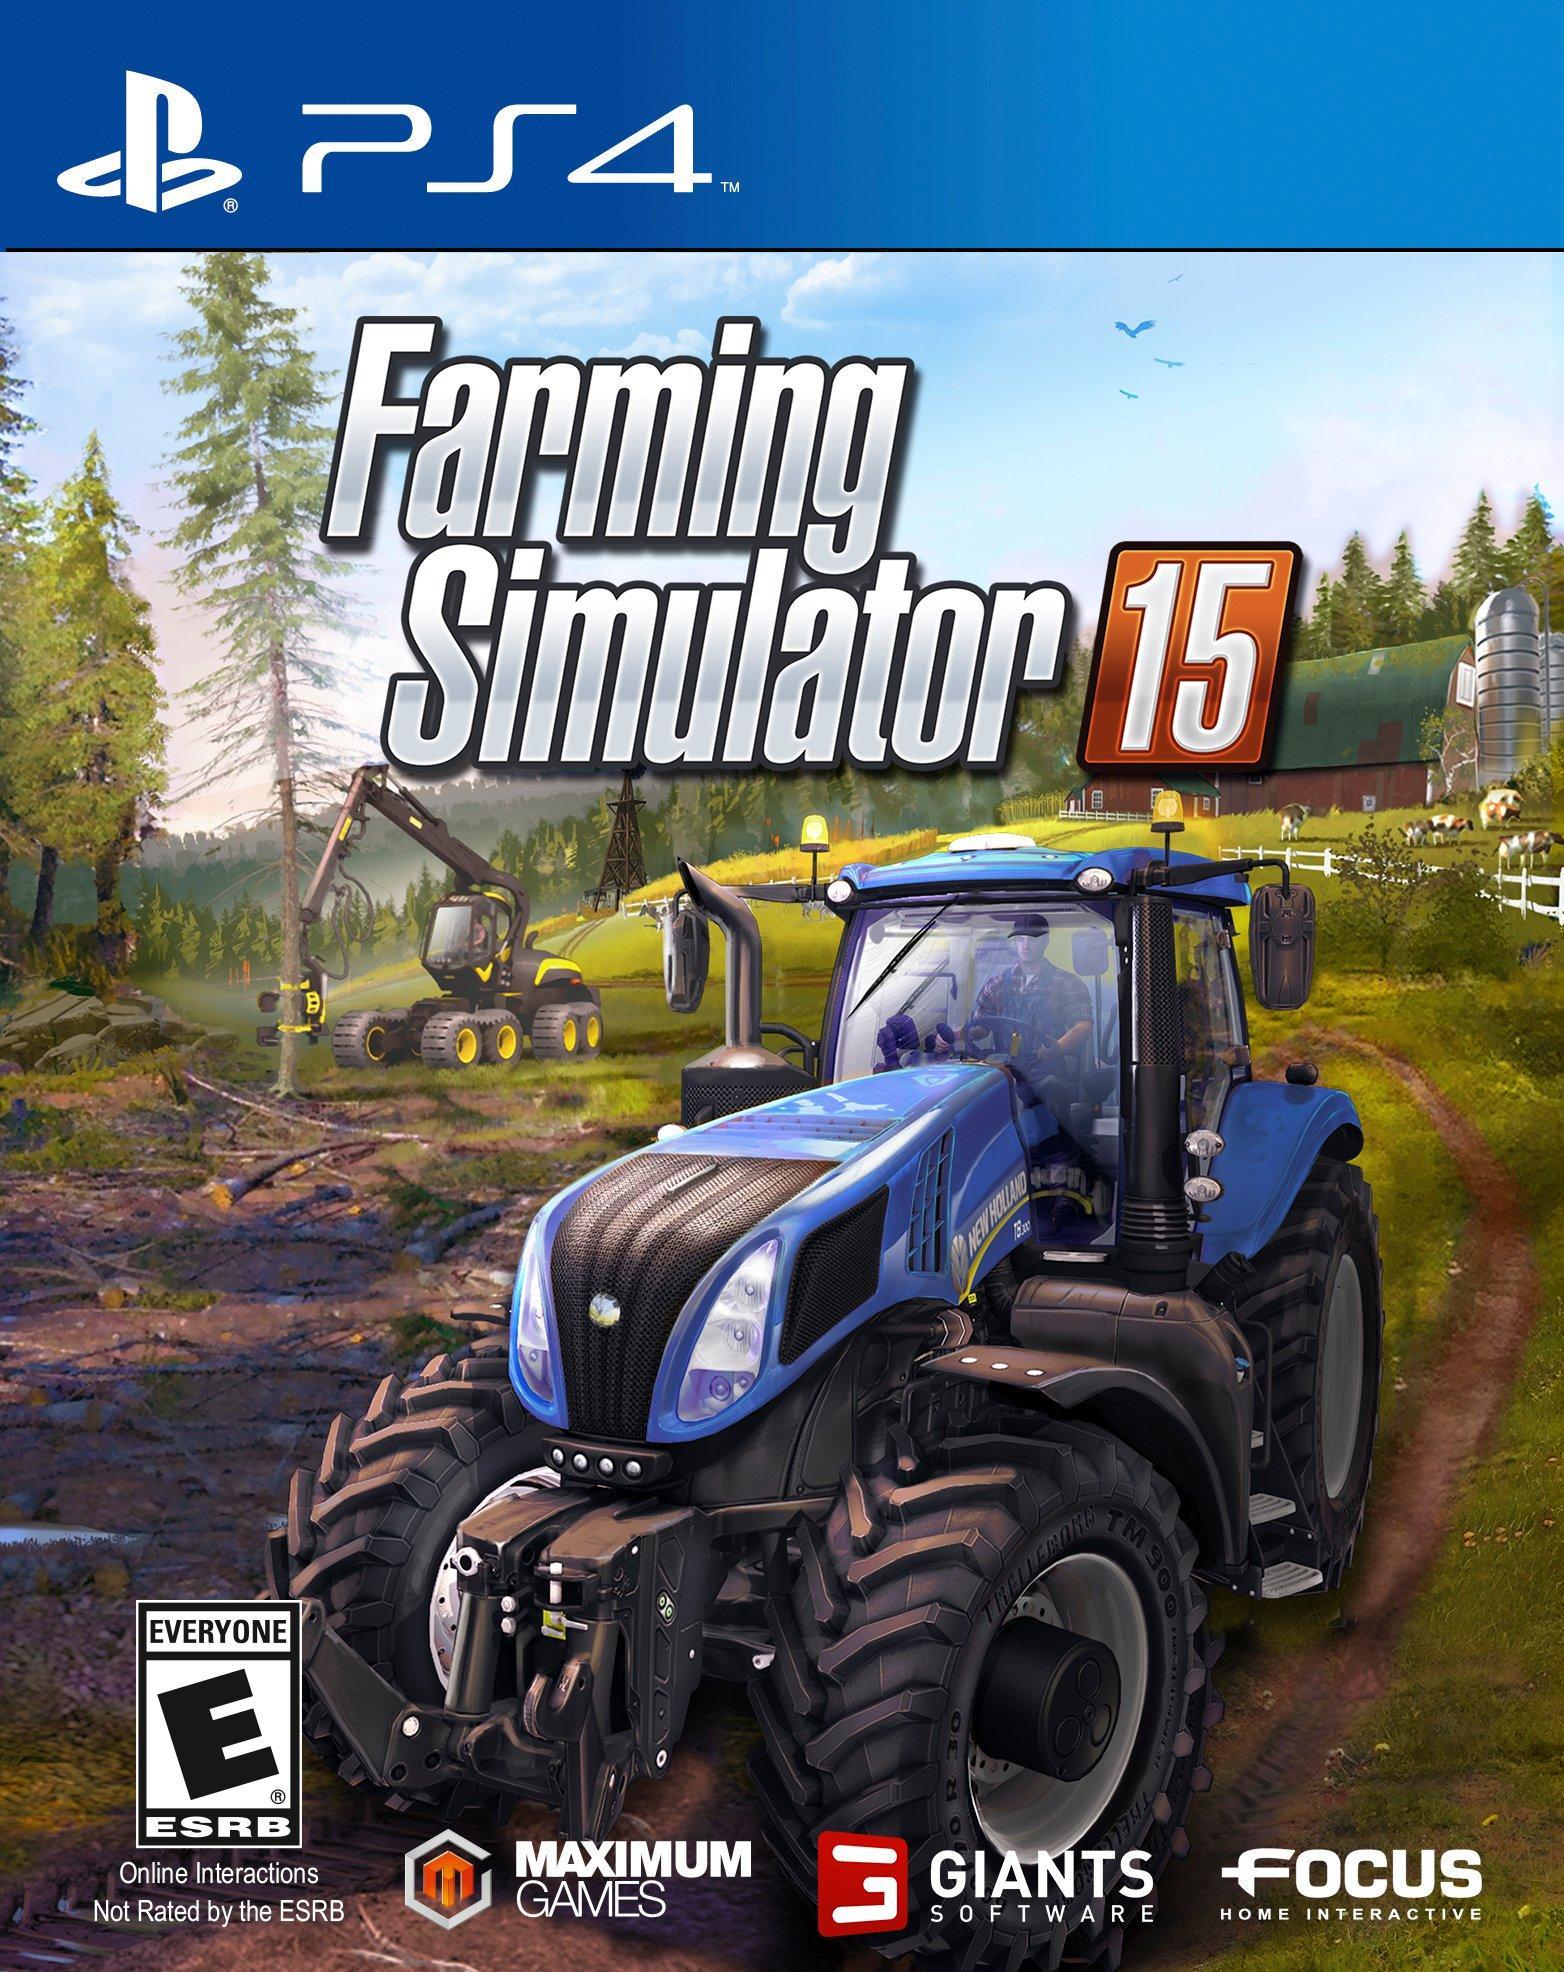 Farming Simulator 15 | PlayStation 4 | GameStop